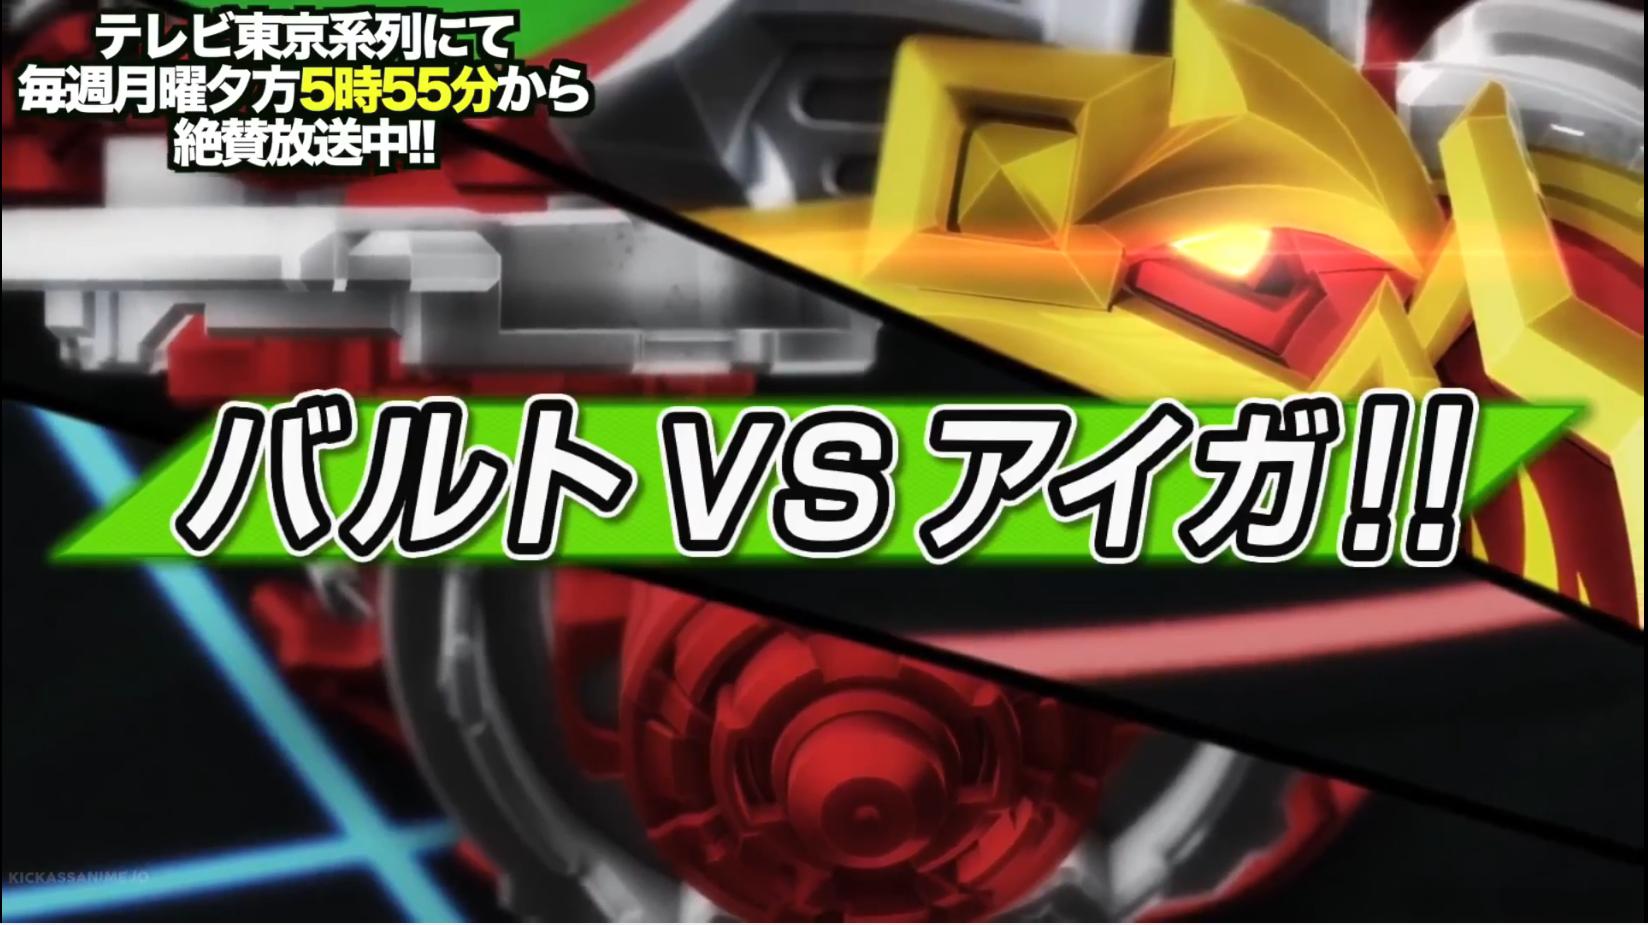 Beyblade Burst Turbo - Episode 28 | Beyblade Wiki | FANDOM powered